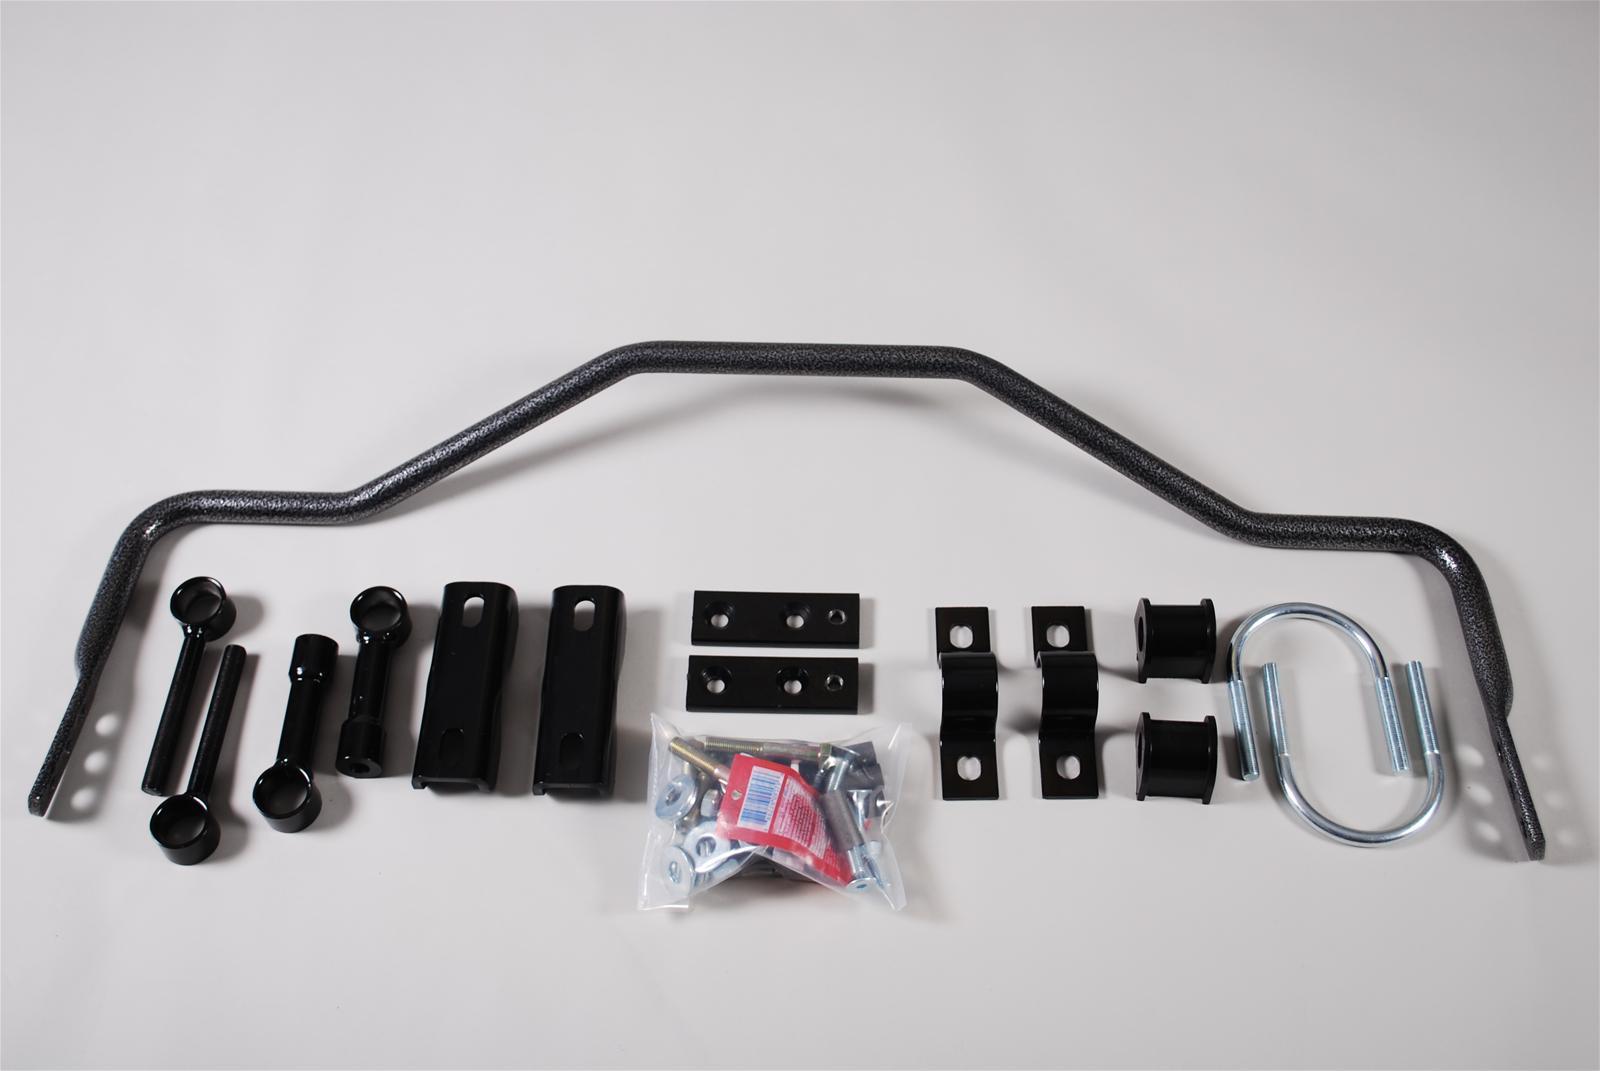 230 Bobcat Tractor Adjustable Stabilizer Bar : Hellwig motorsports tubular sway bars free